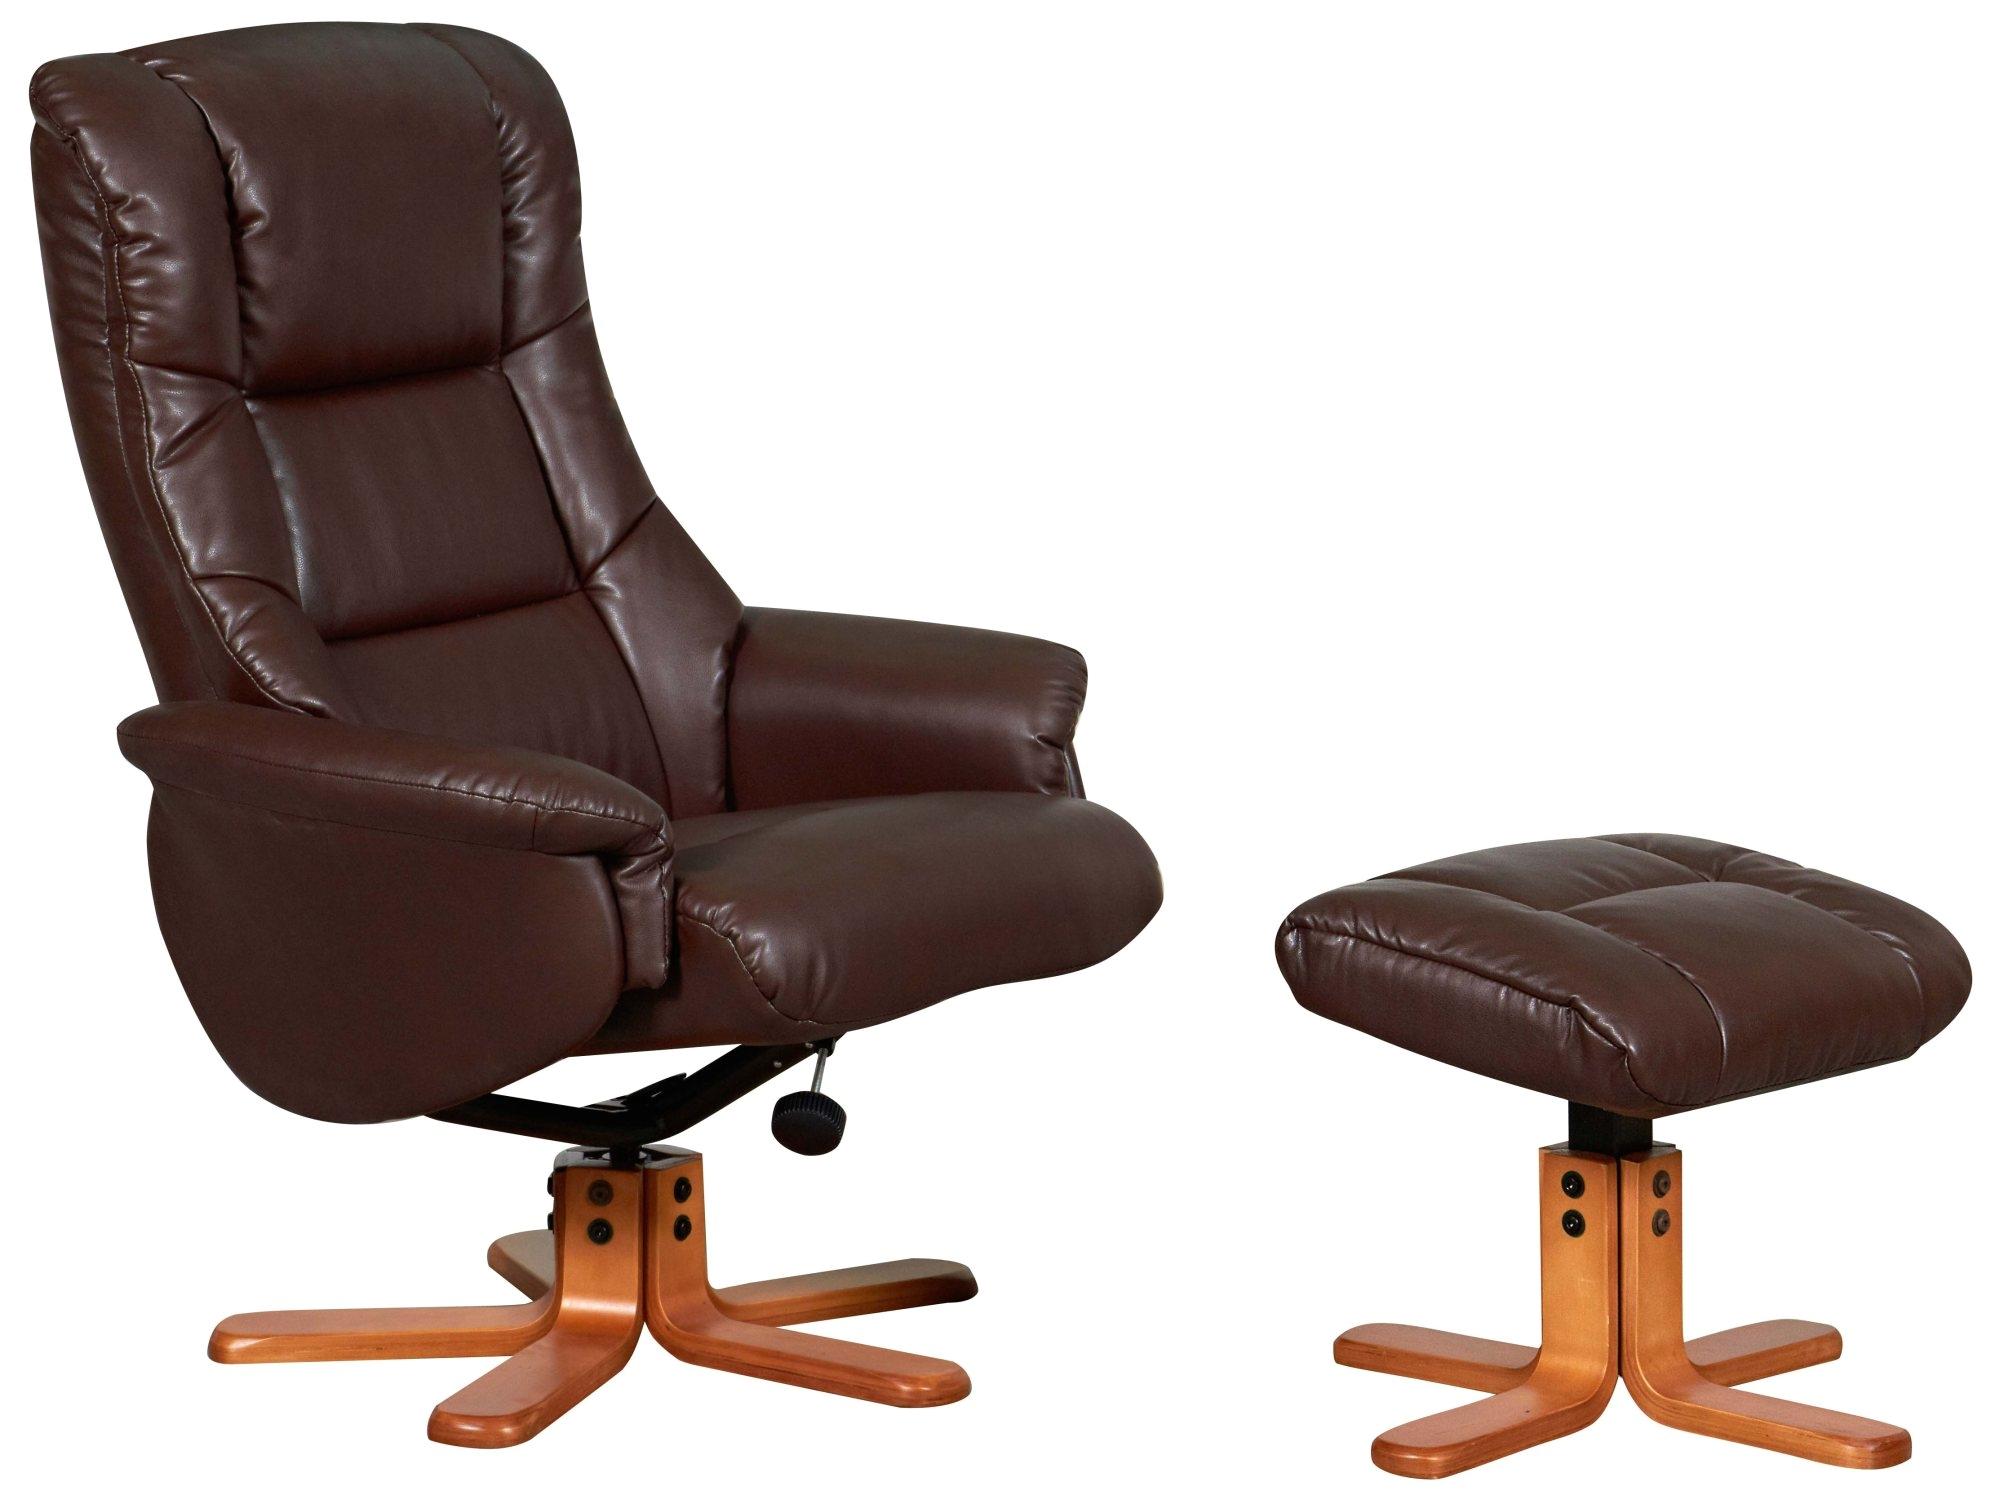 Slumberland Leather Chairs Bergen Recliner Chair Stool Set Nut Brown